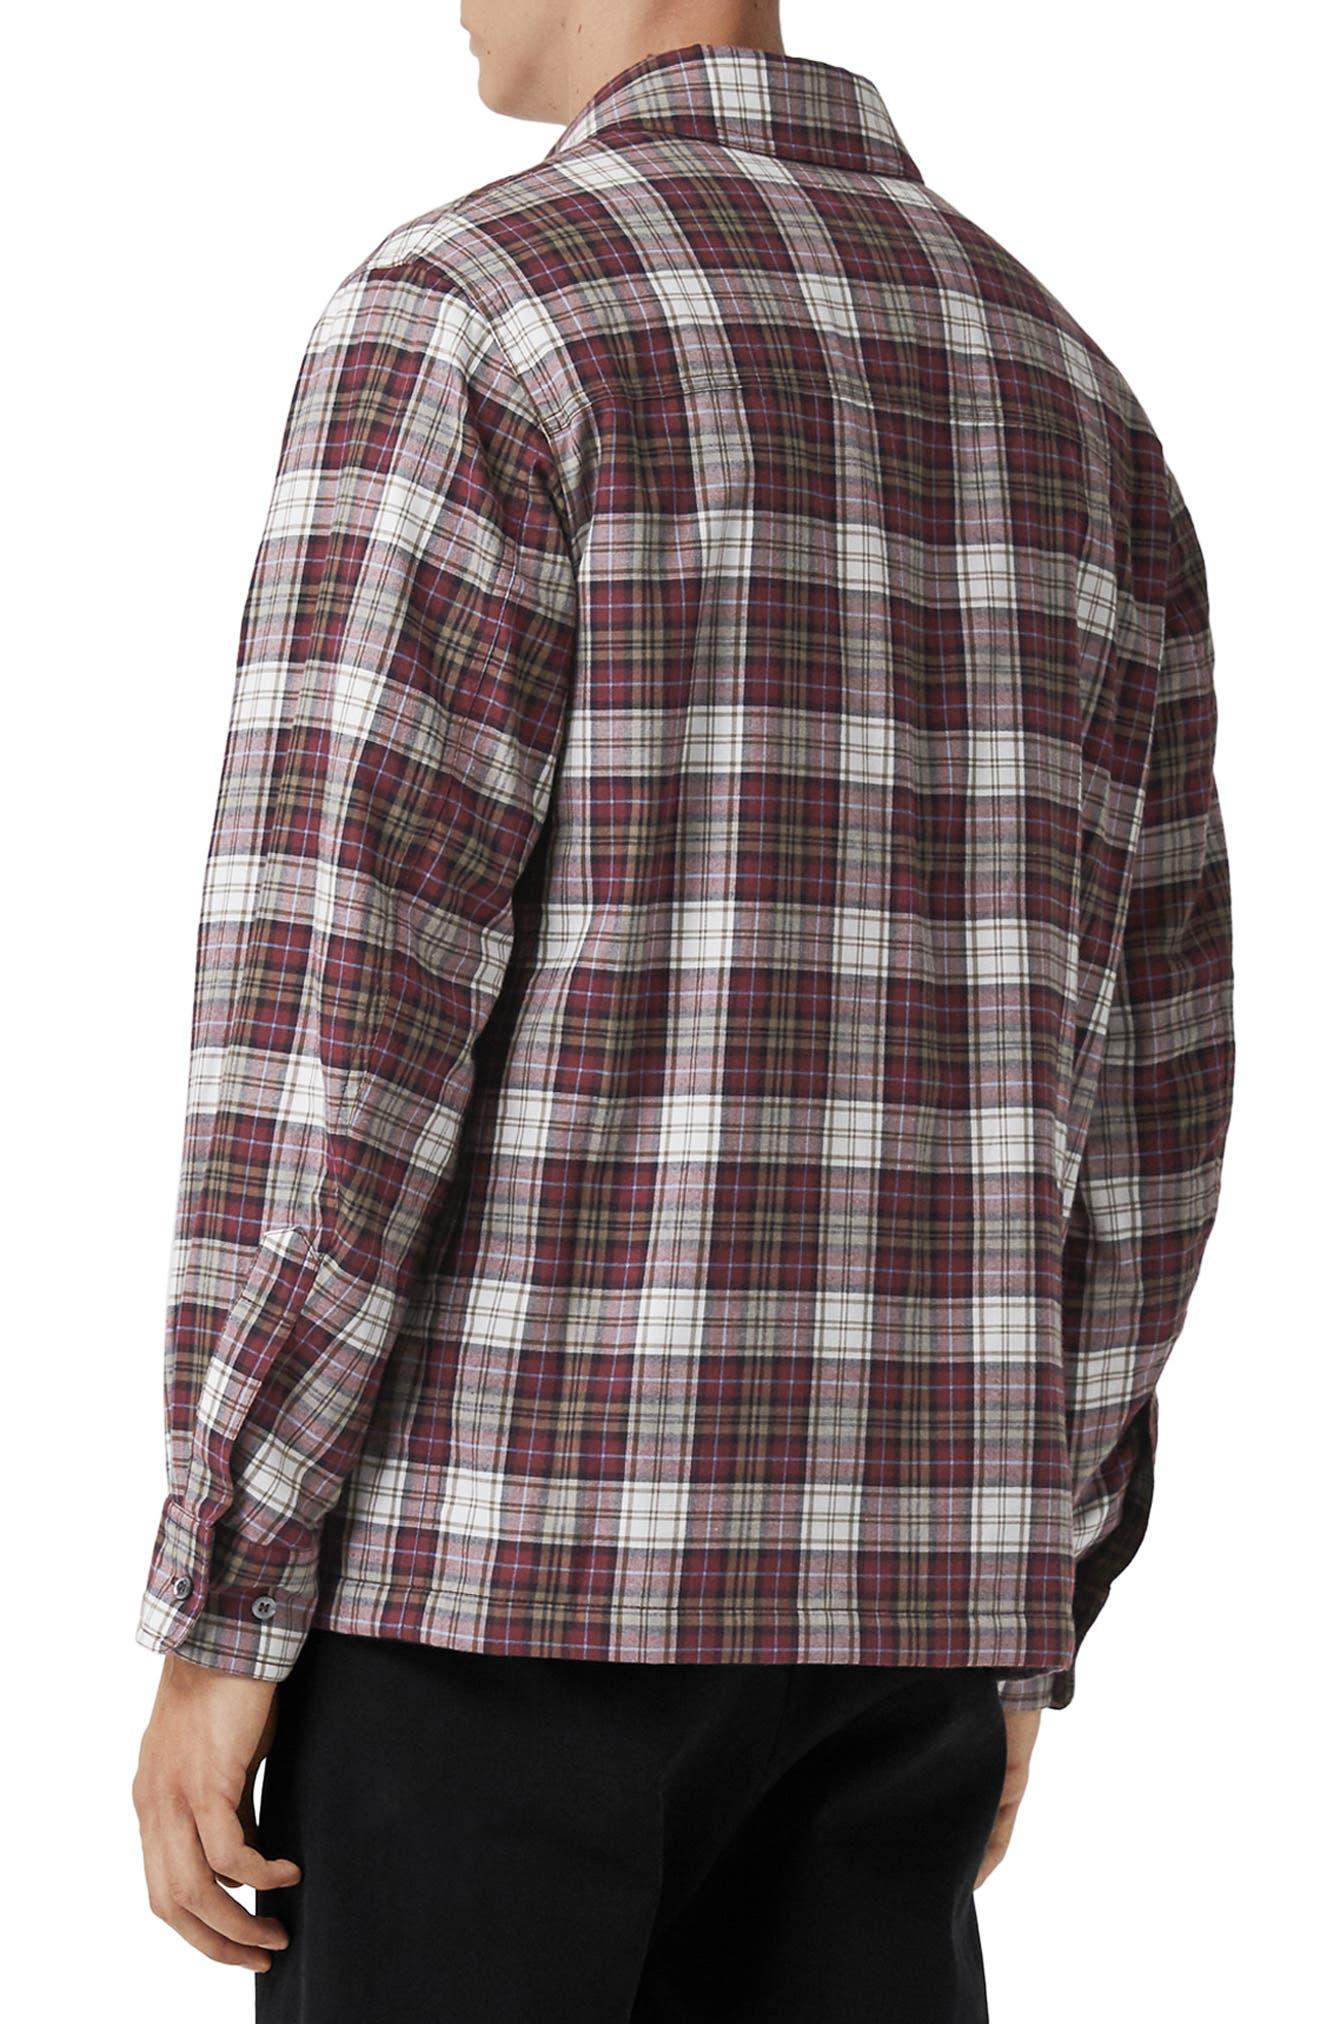 Barlow Plaid Flannel Shirt,                             Alternate thumbnail 4, color,                             600